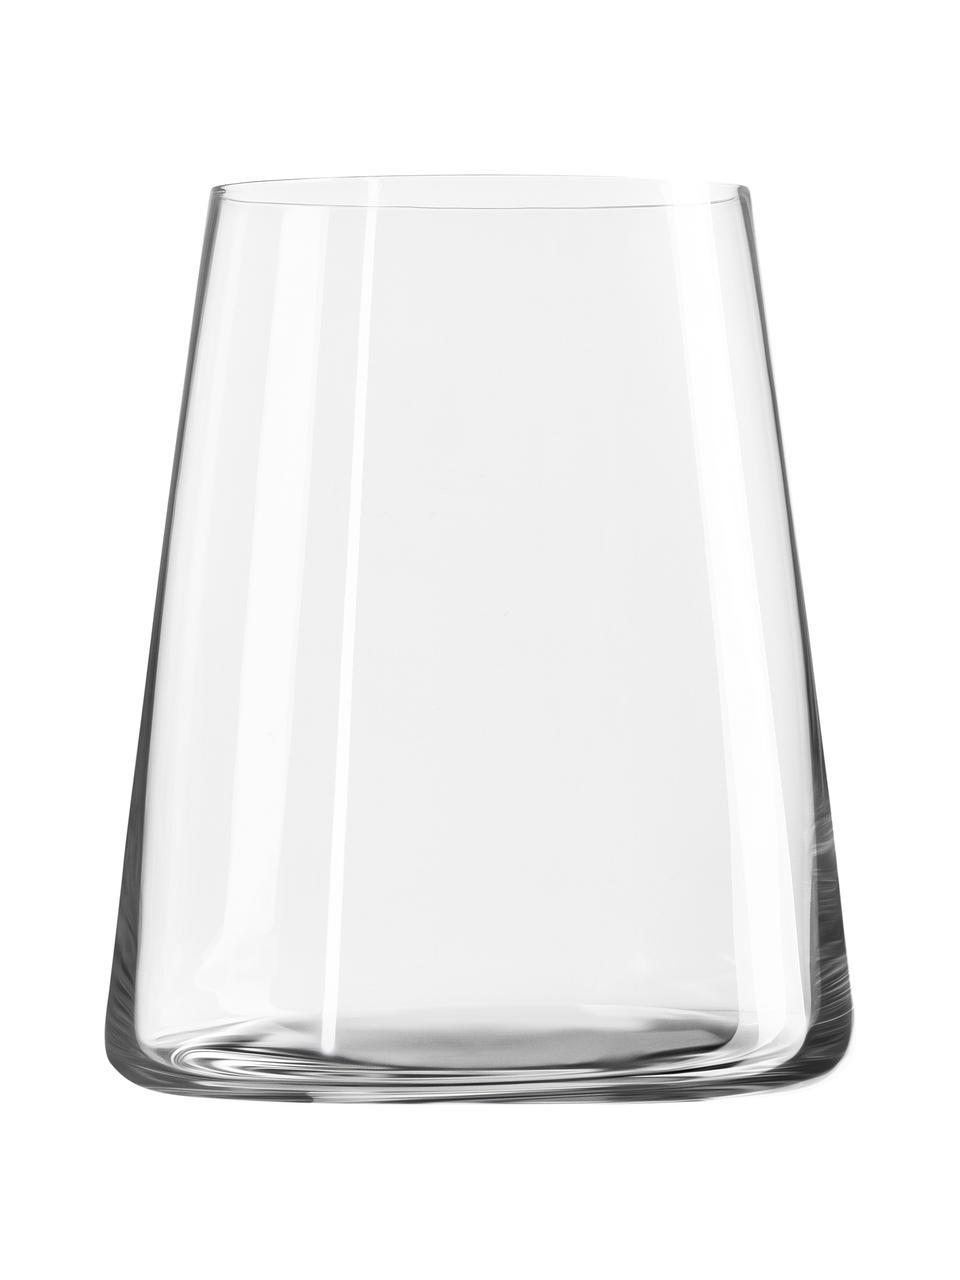 Kristallgläser Power in Kegelform, 6 Stück, Kristallglas, Transparent, Ø 9 x H 10 cm